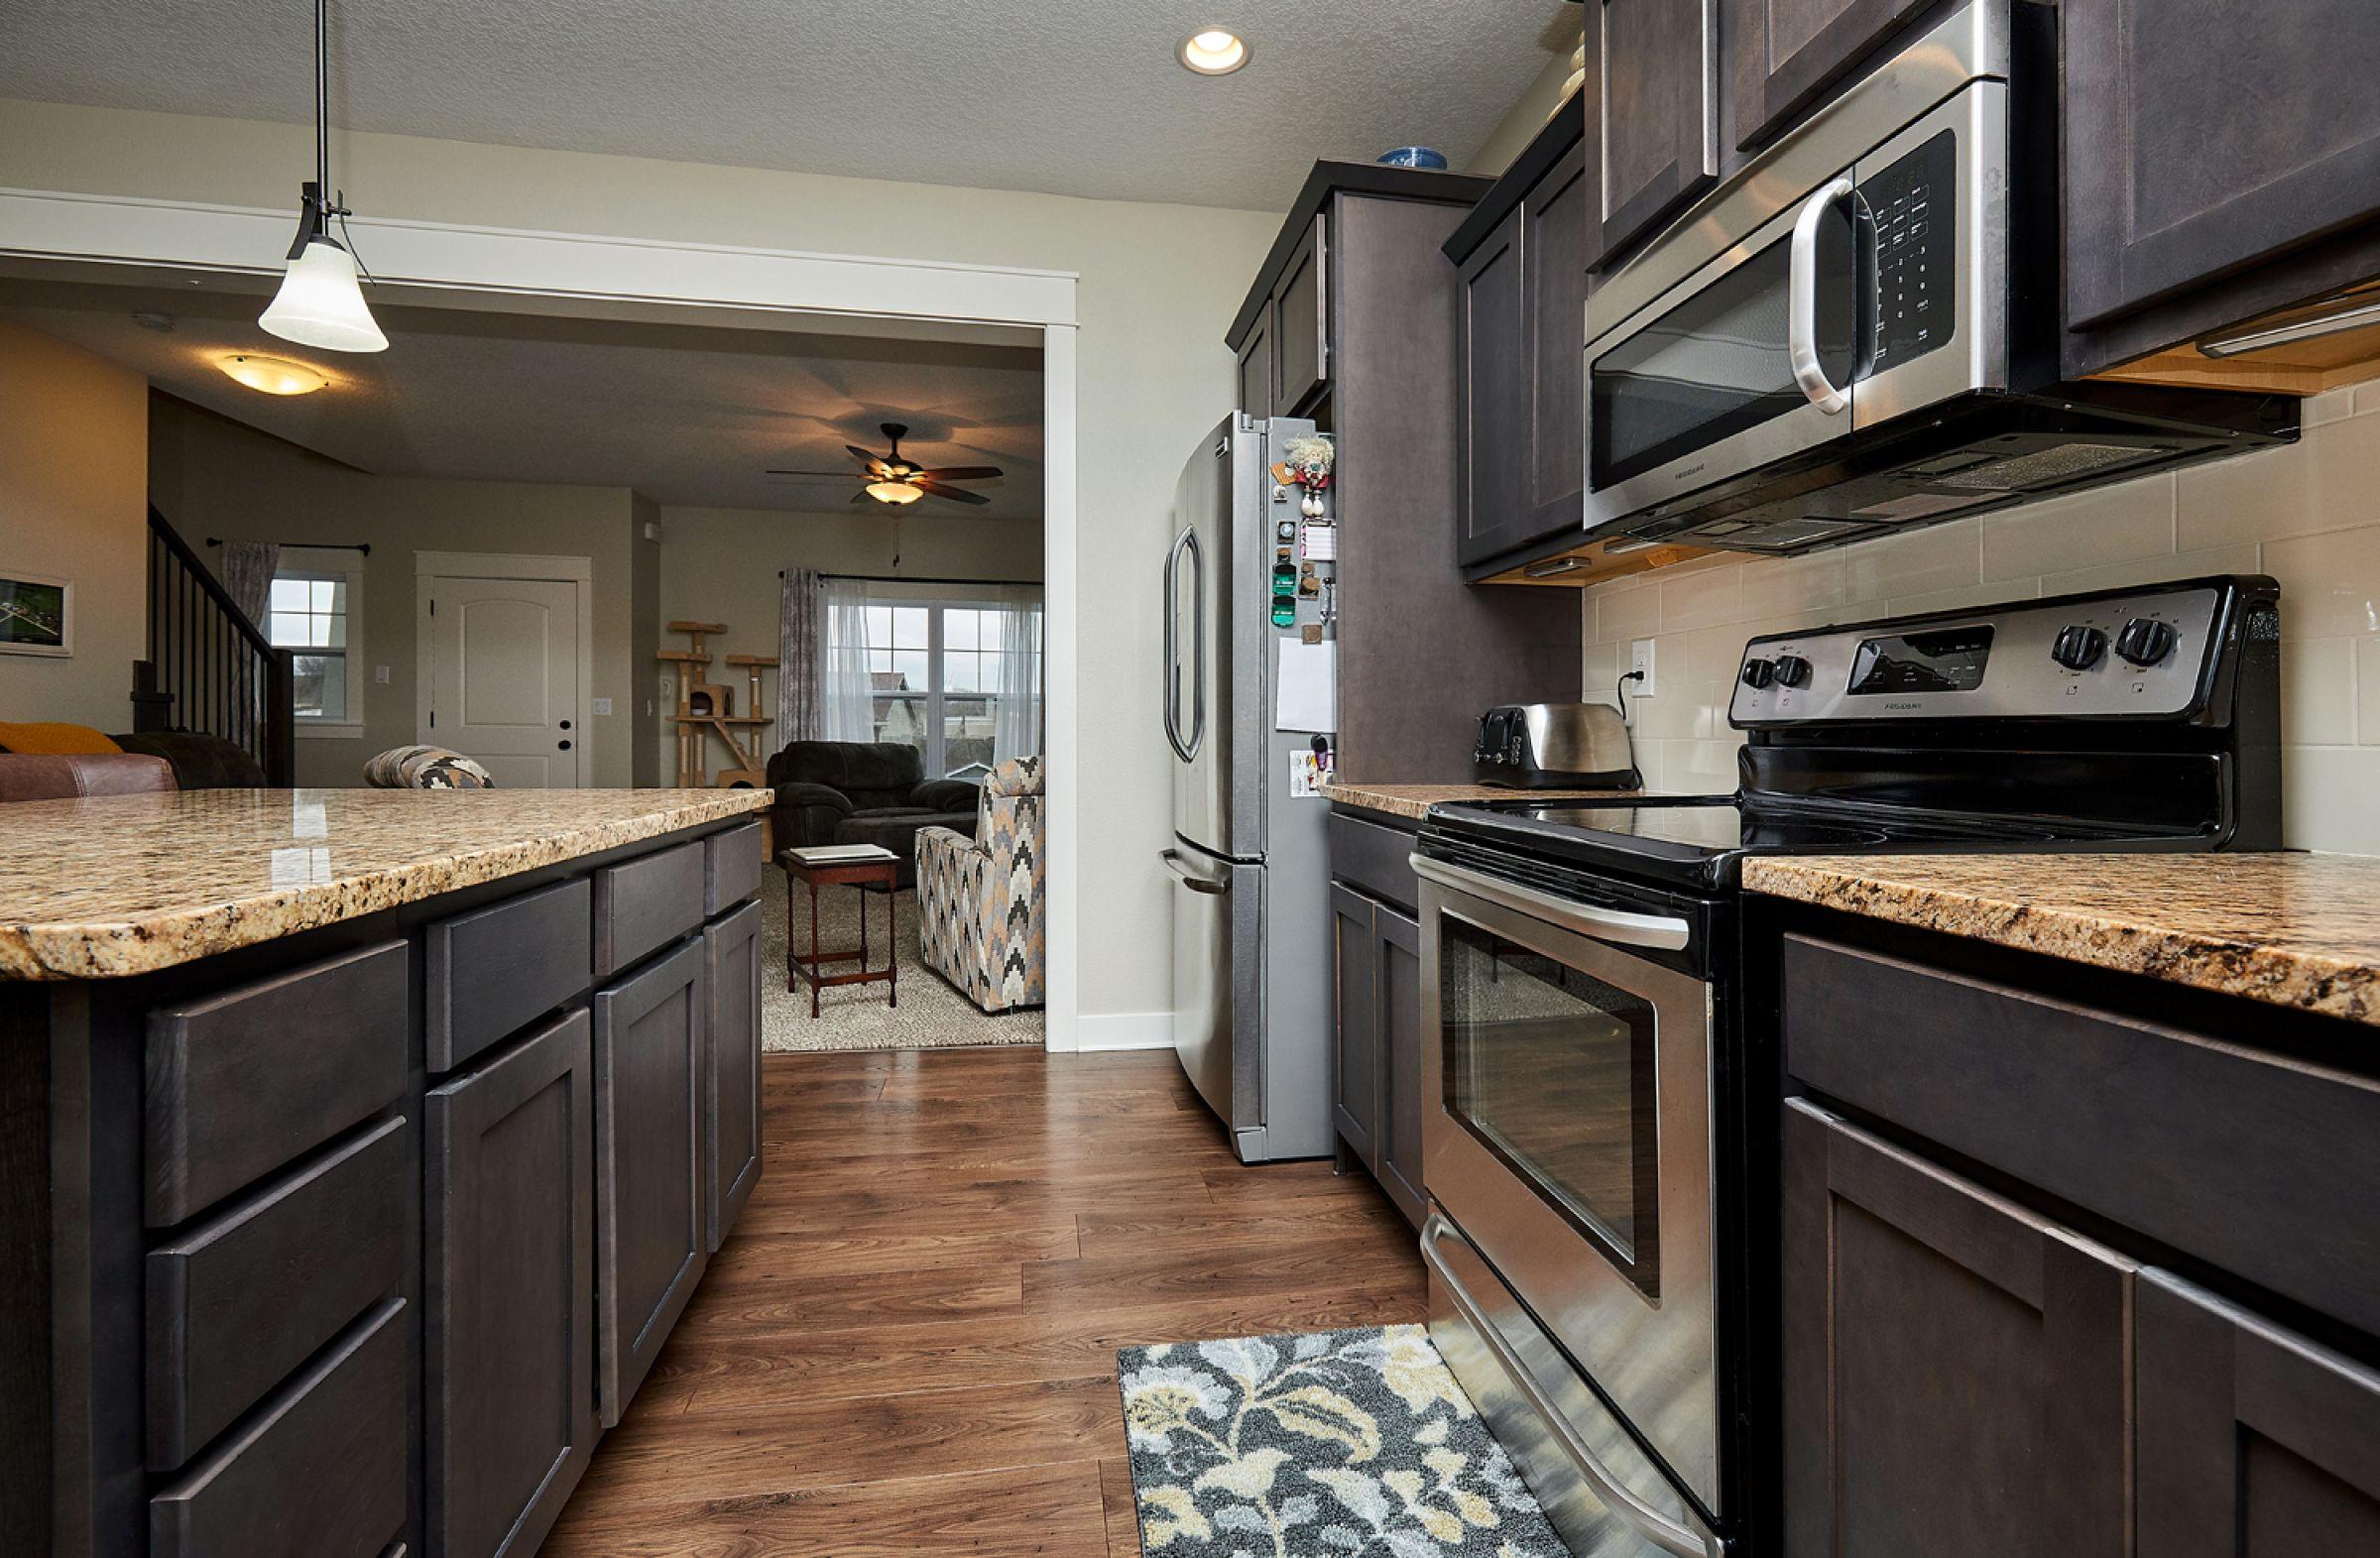 residential-warren-county-iowa-1-acres-listing-number-15254-18-2020-11-11-165832.jpg